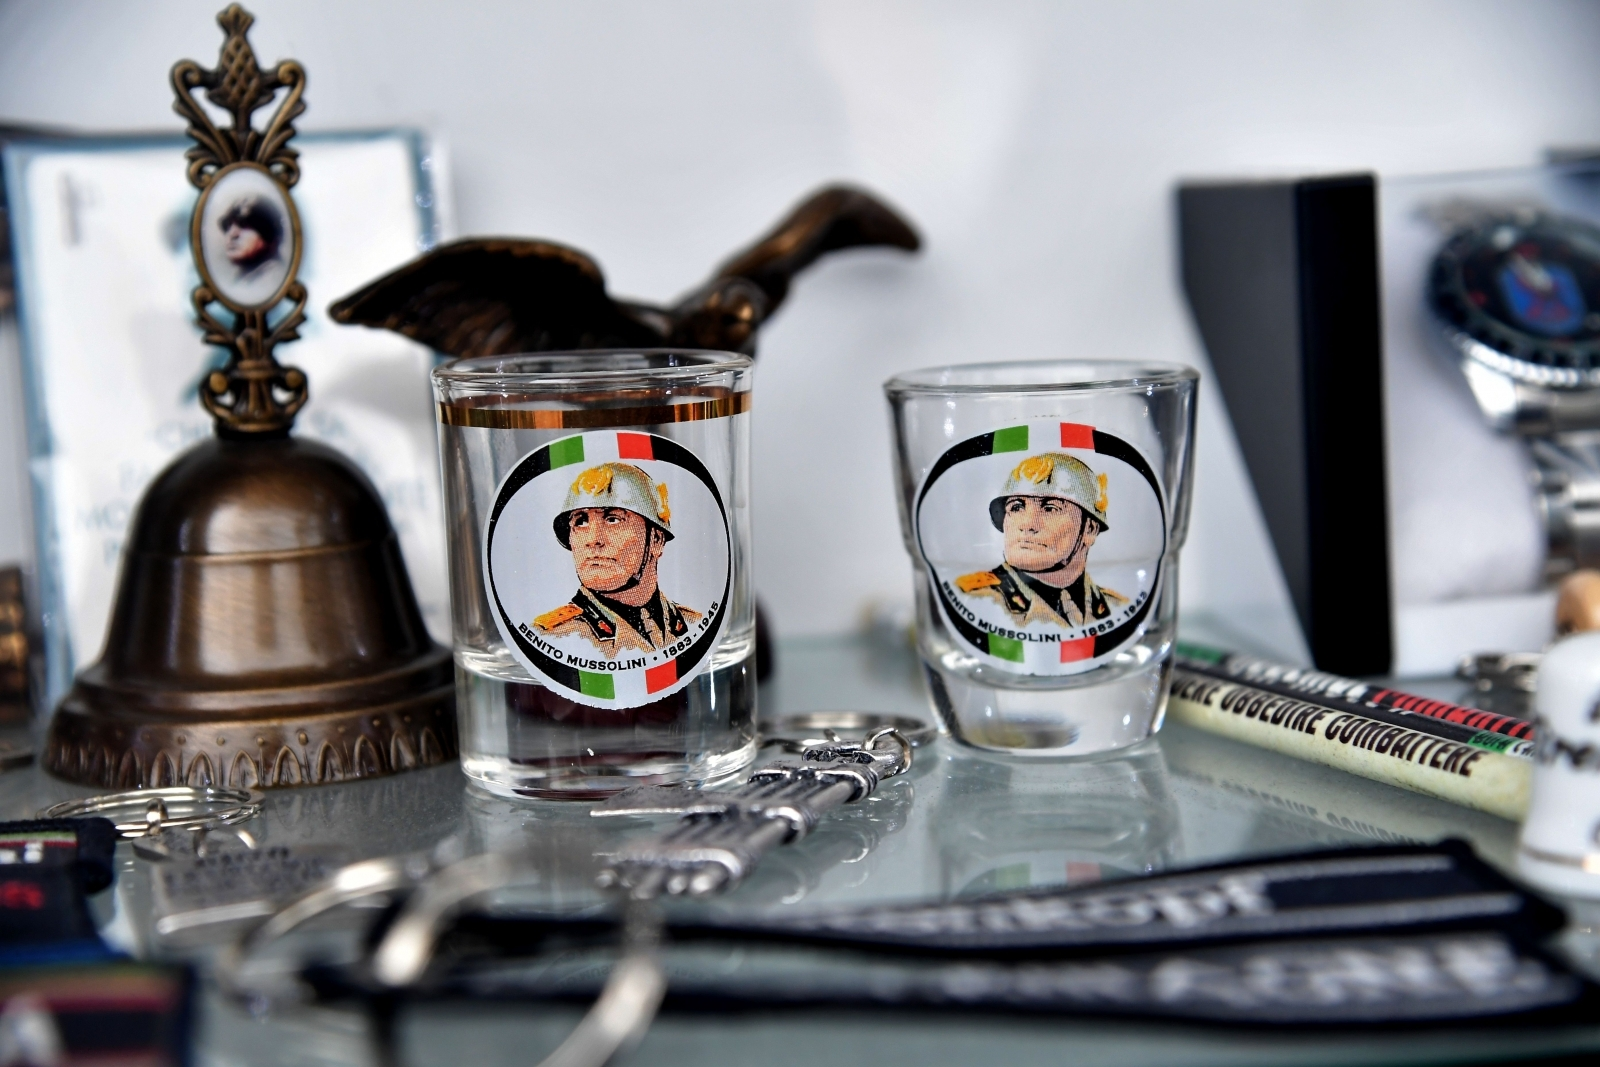 Mussolini shot glasses